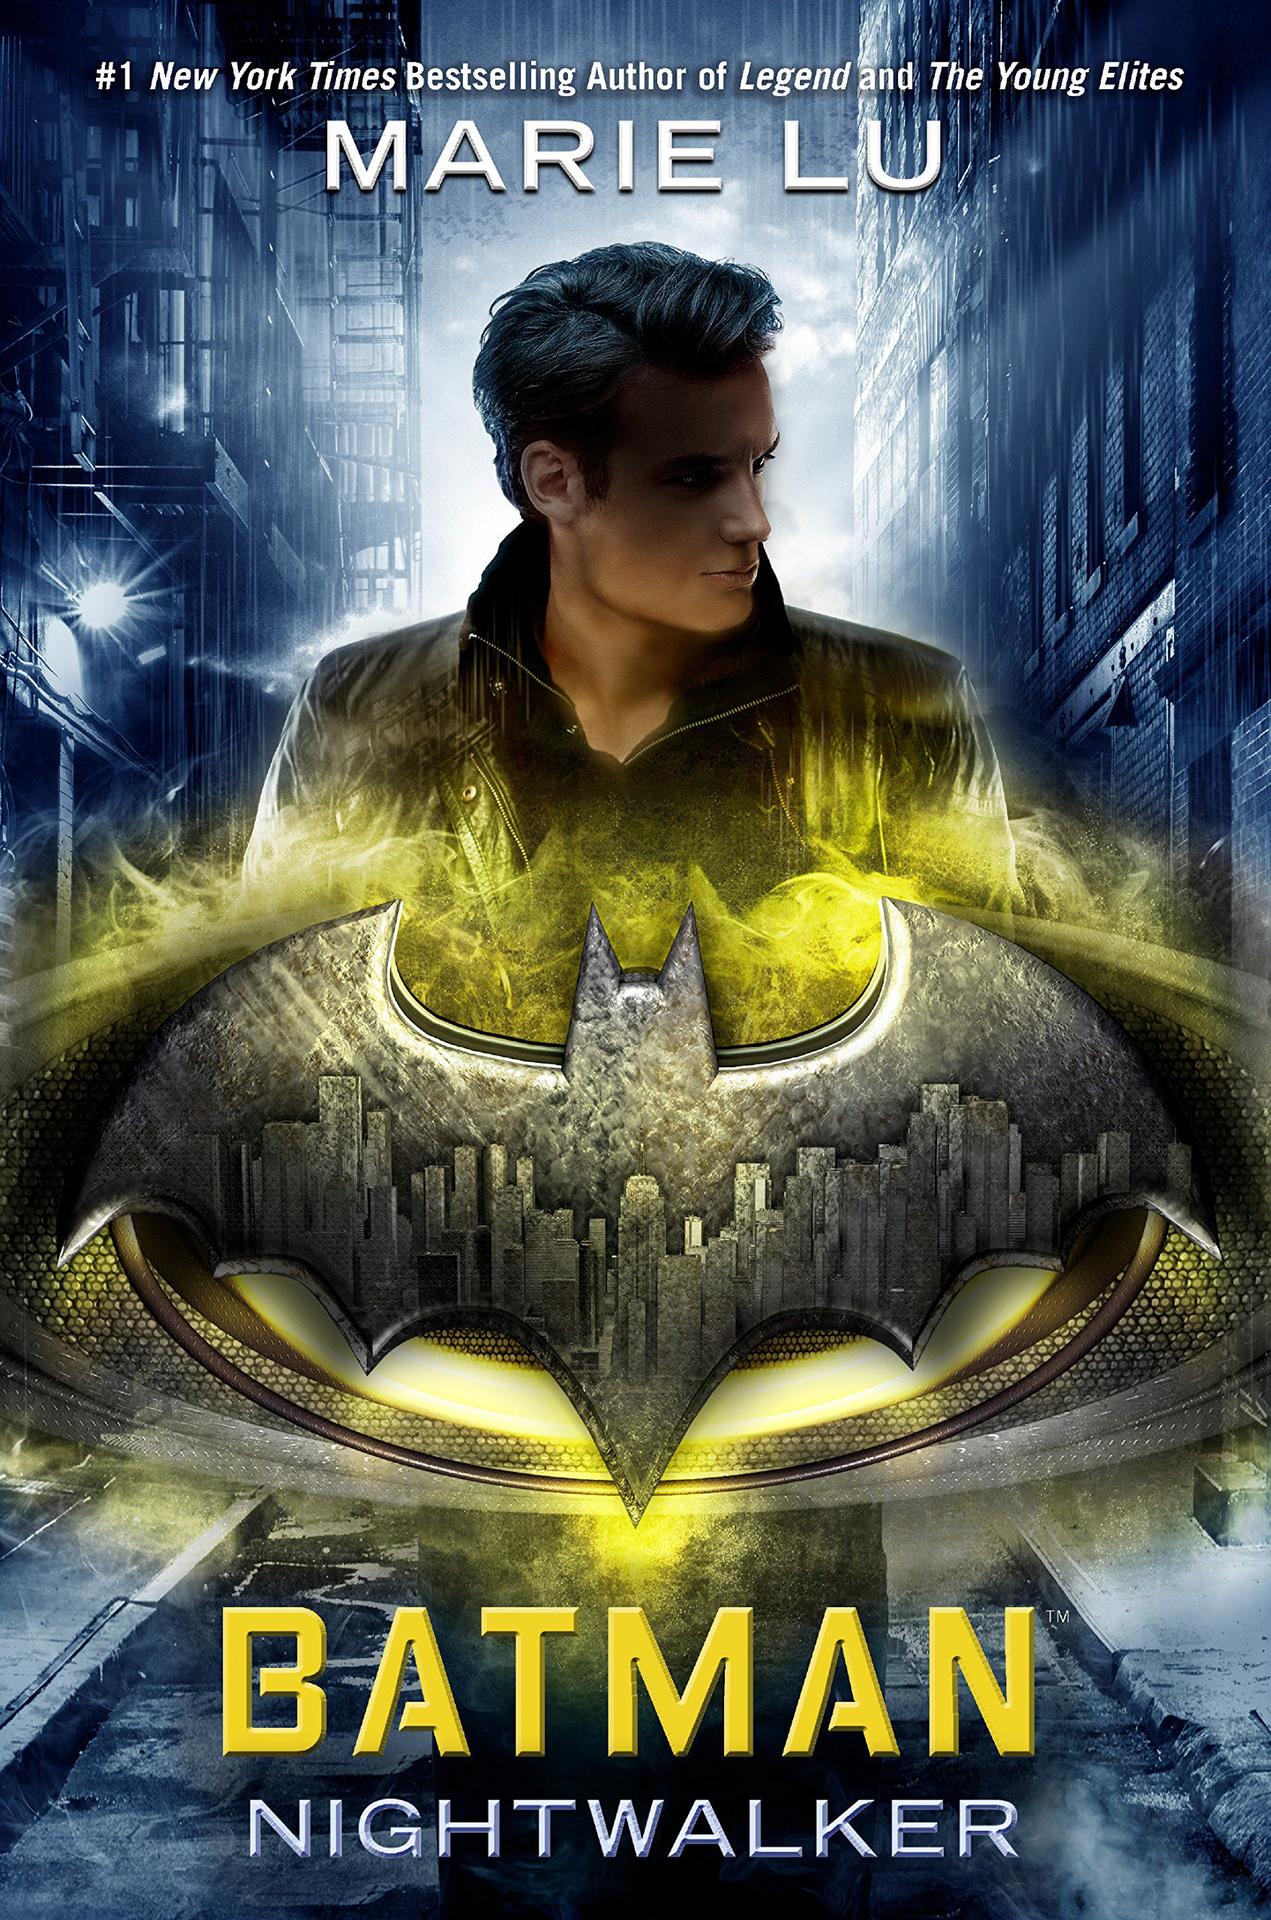 Book cover for Batman: Nightwalker